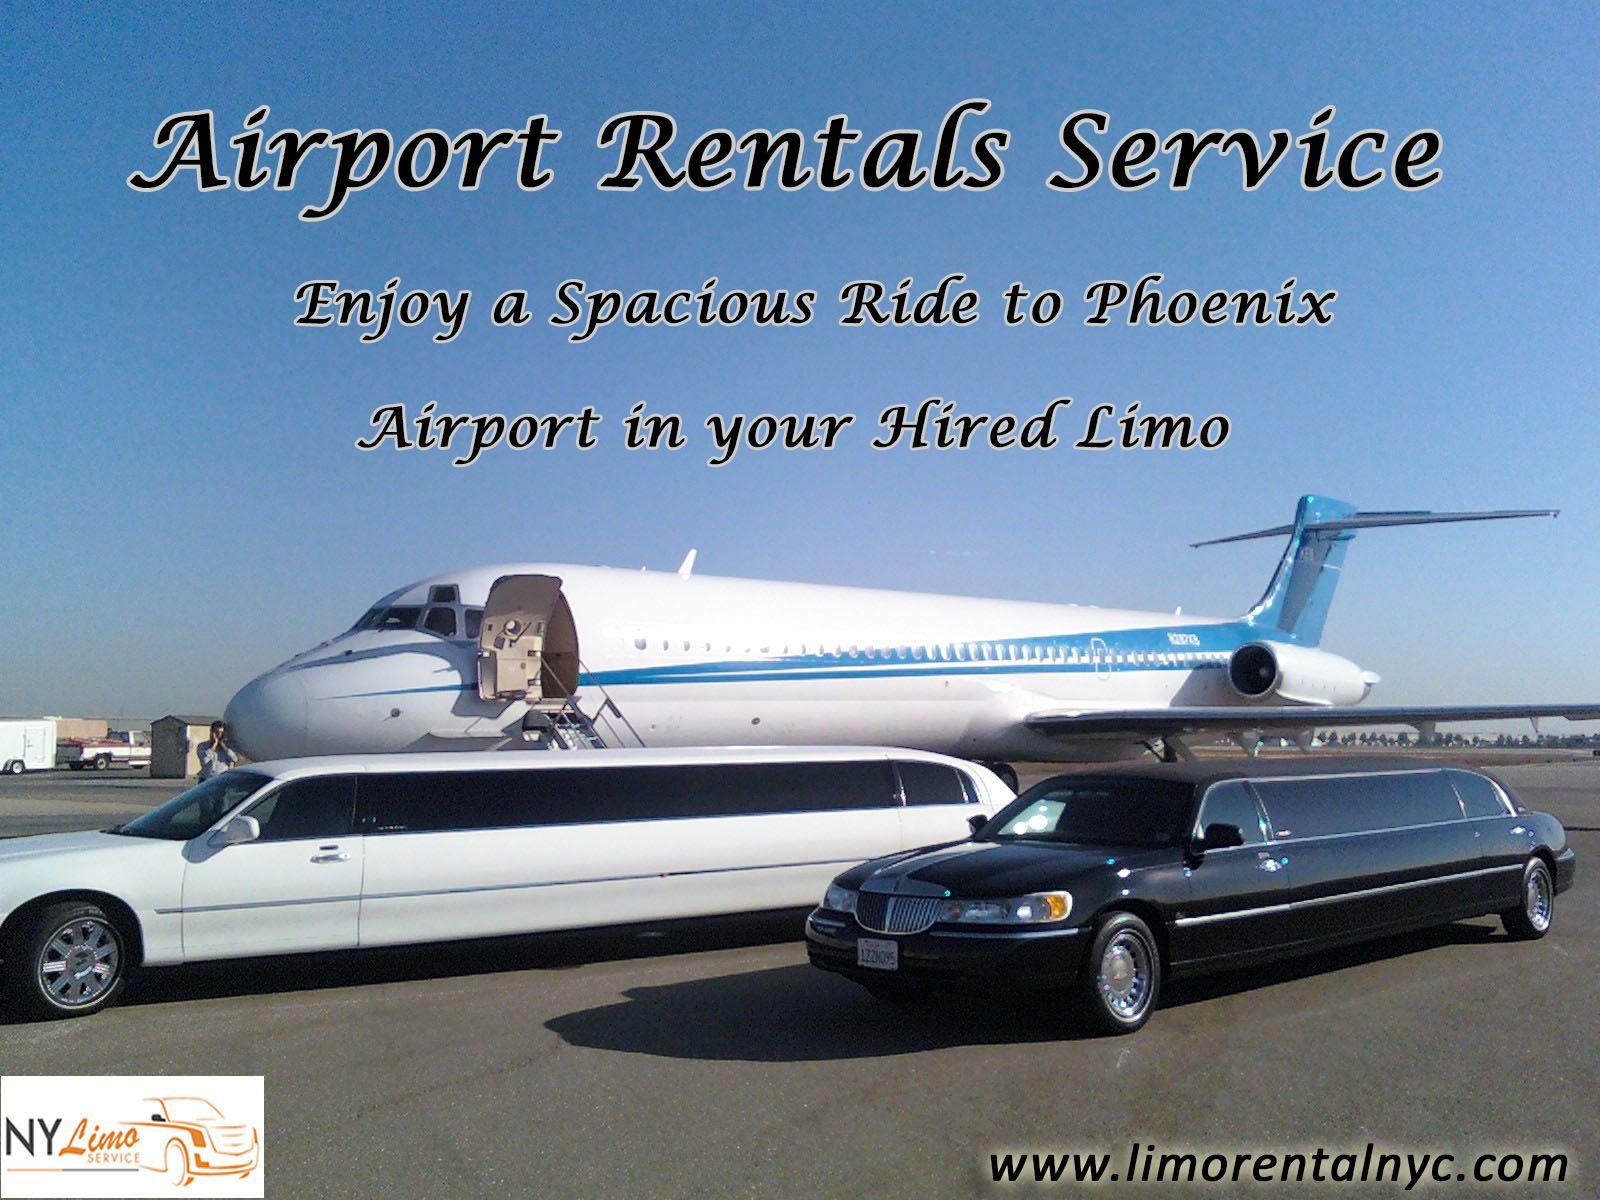 Limo Service Phoenix Airport Limo Rental Limo Airport Limo